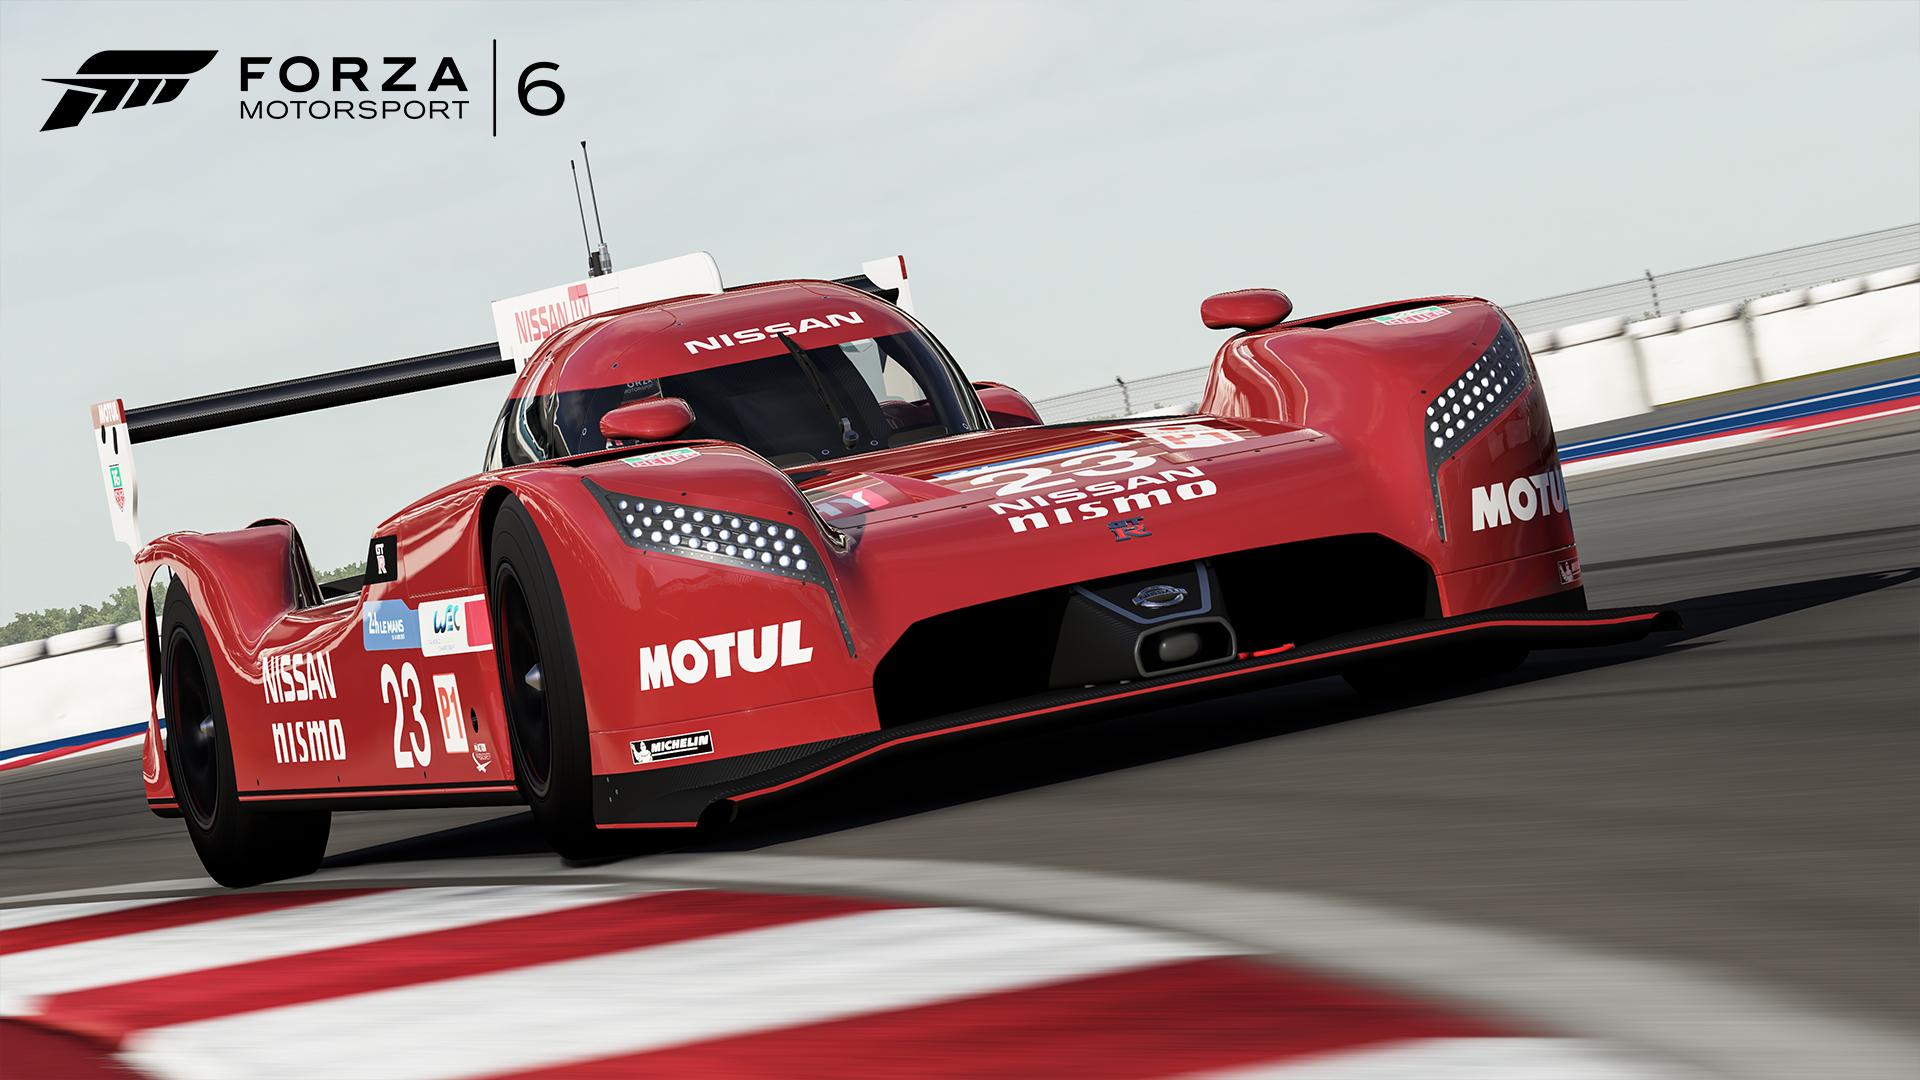 Forza Motorsport Forza Motorsport 6 November Content Update